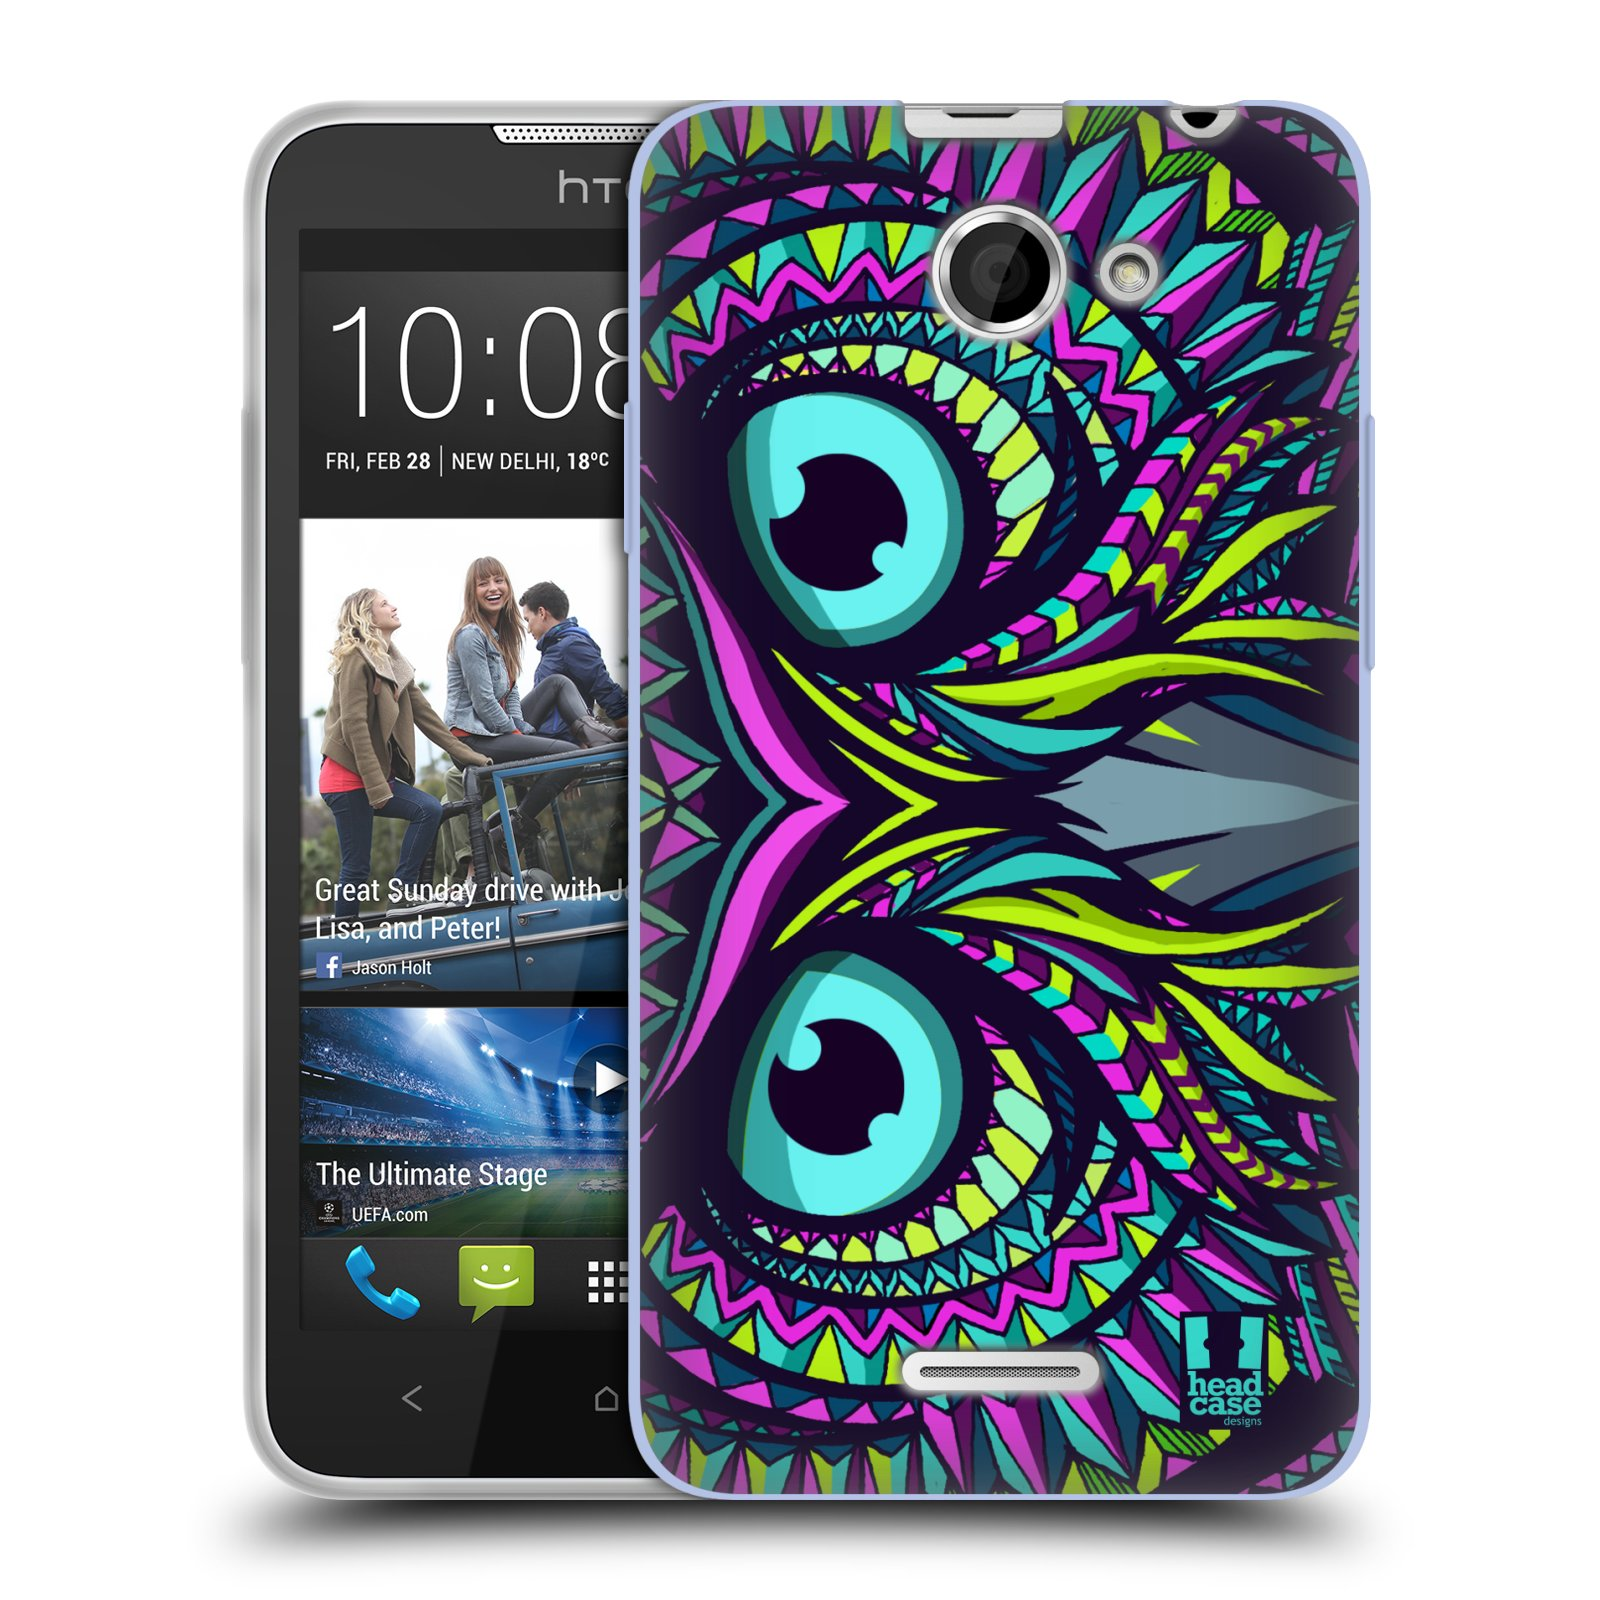 Silikonové pouzdro na mobil HTC Desire 516 HEAD CASE AZTEC SOVA (Silikonový kryt či obal na mobilní telefon HTC Desire 516 Dual SIM)